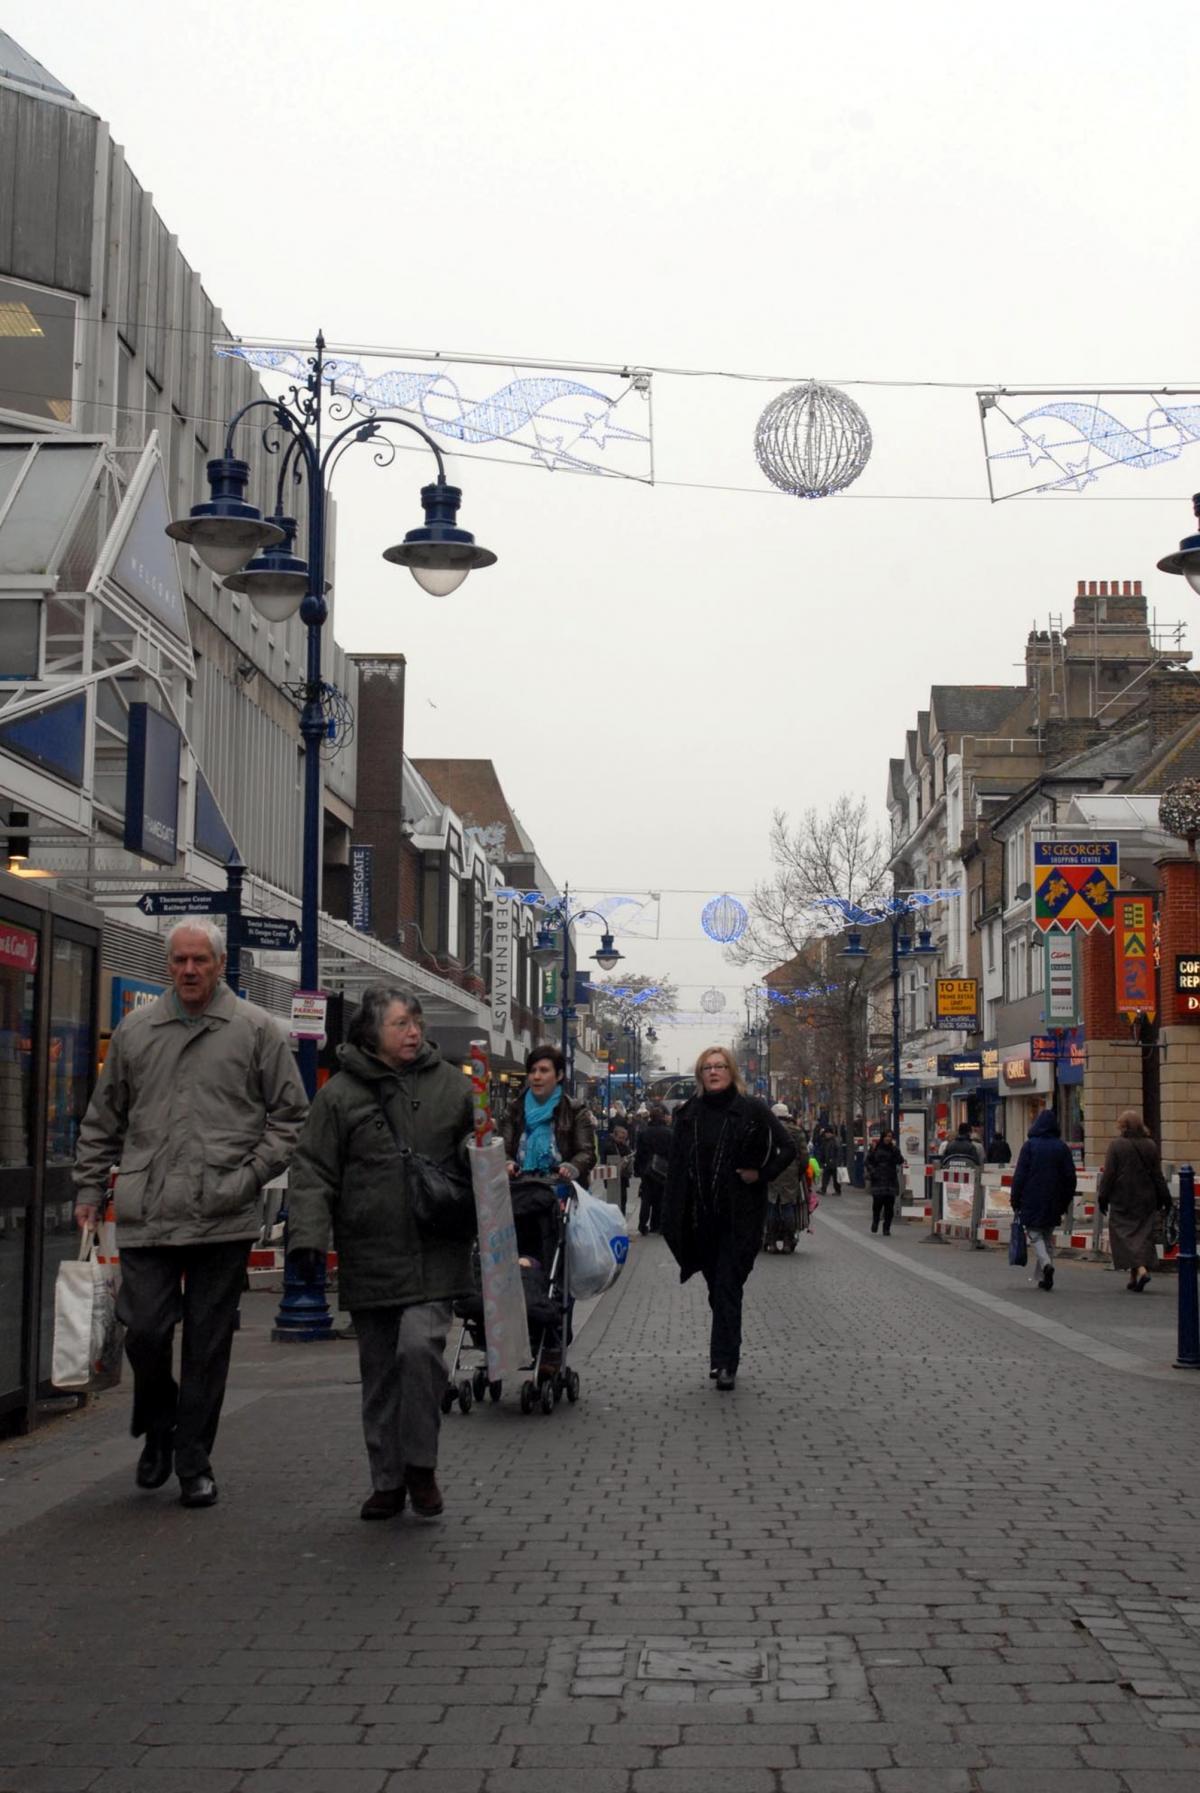 Gravesend high street